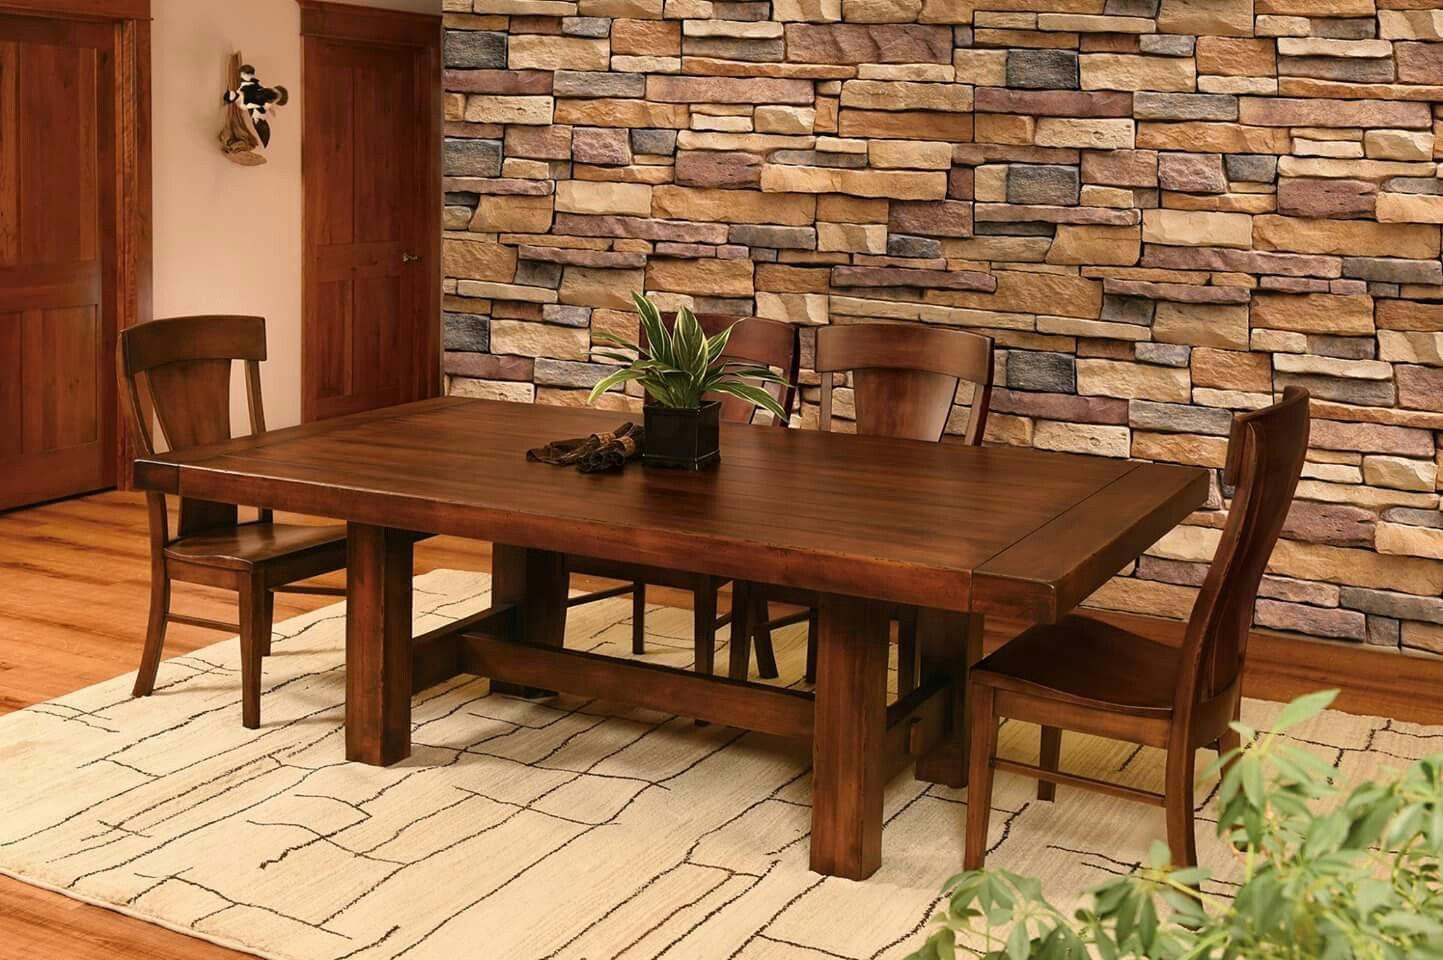 Deutsch Amish Furniture Amish Dining Table | Furniture ...